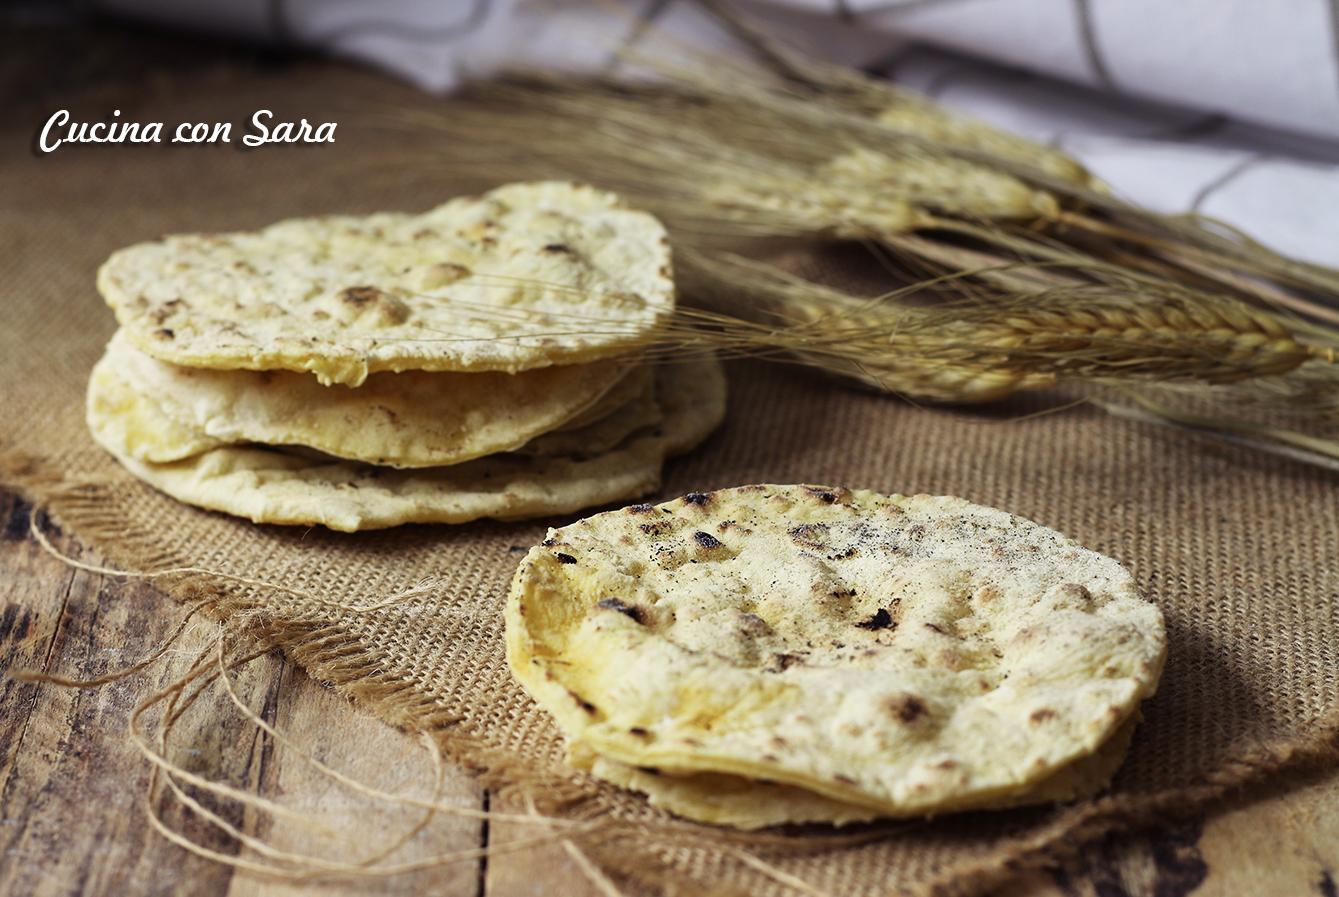 Sfoglie di pane, cucina con sara